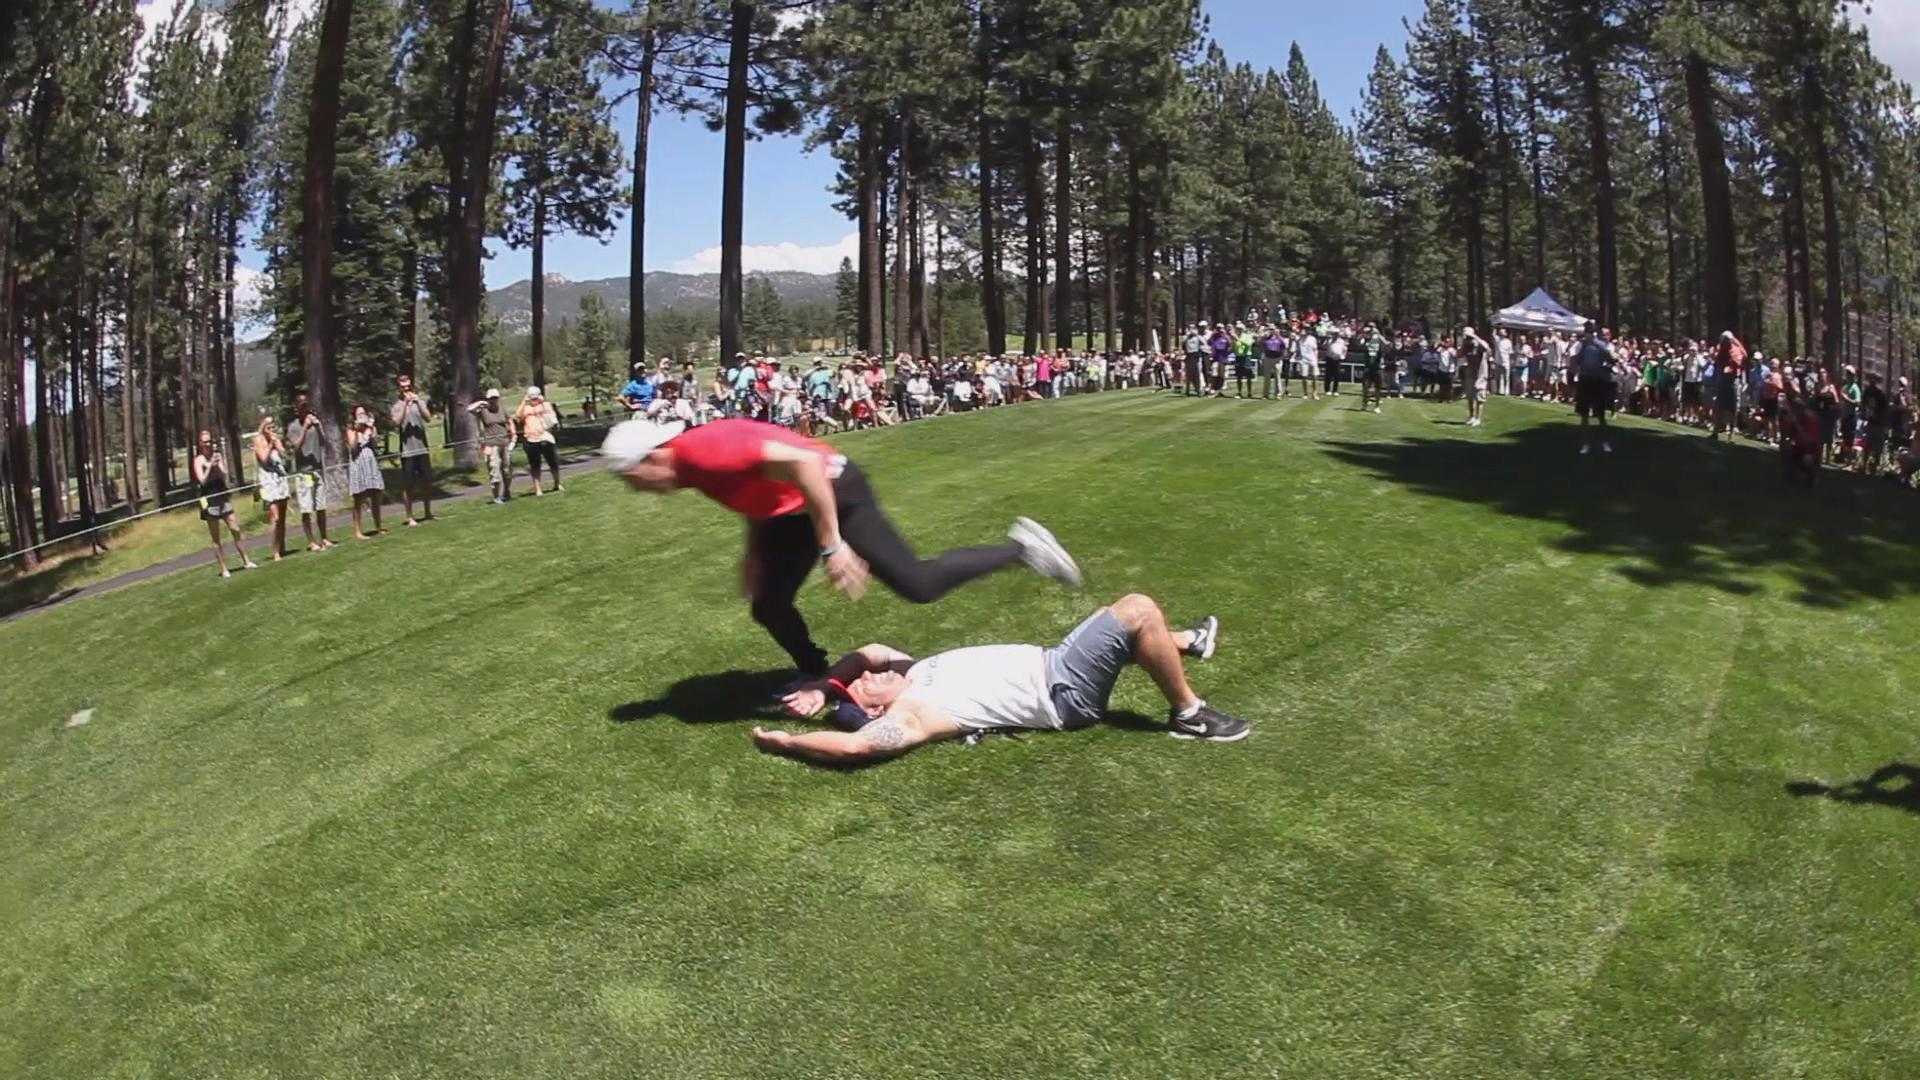 http://golfchannel-a.akamaihd.net/ramp/179/366/hawk_tackle_long_071615.jpg